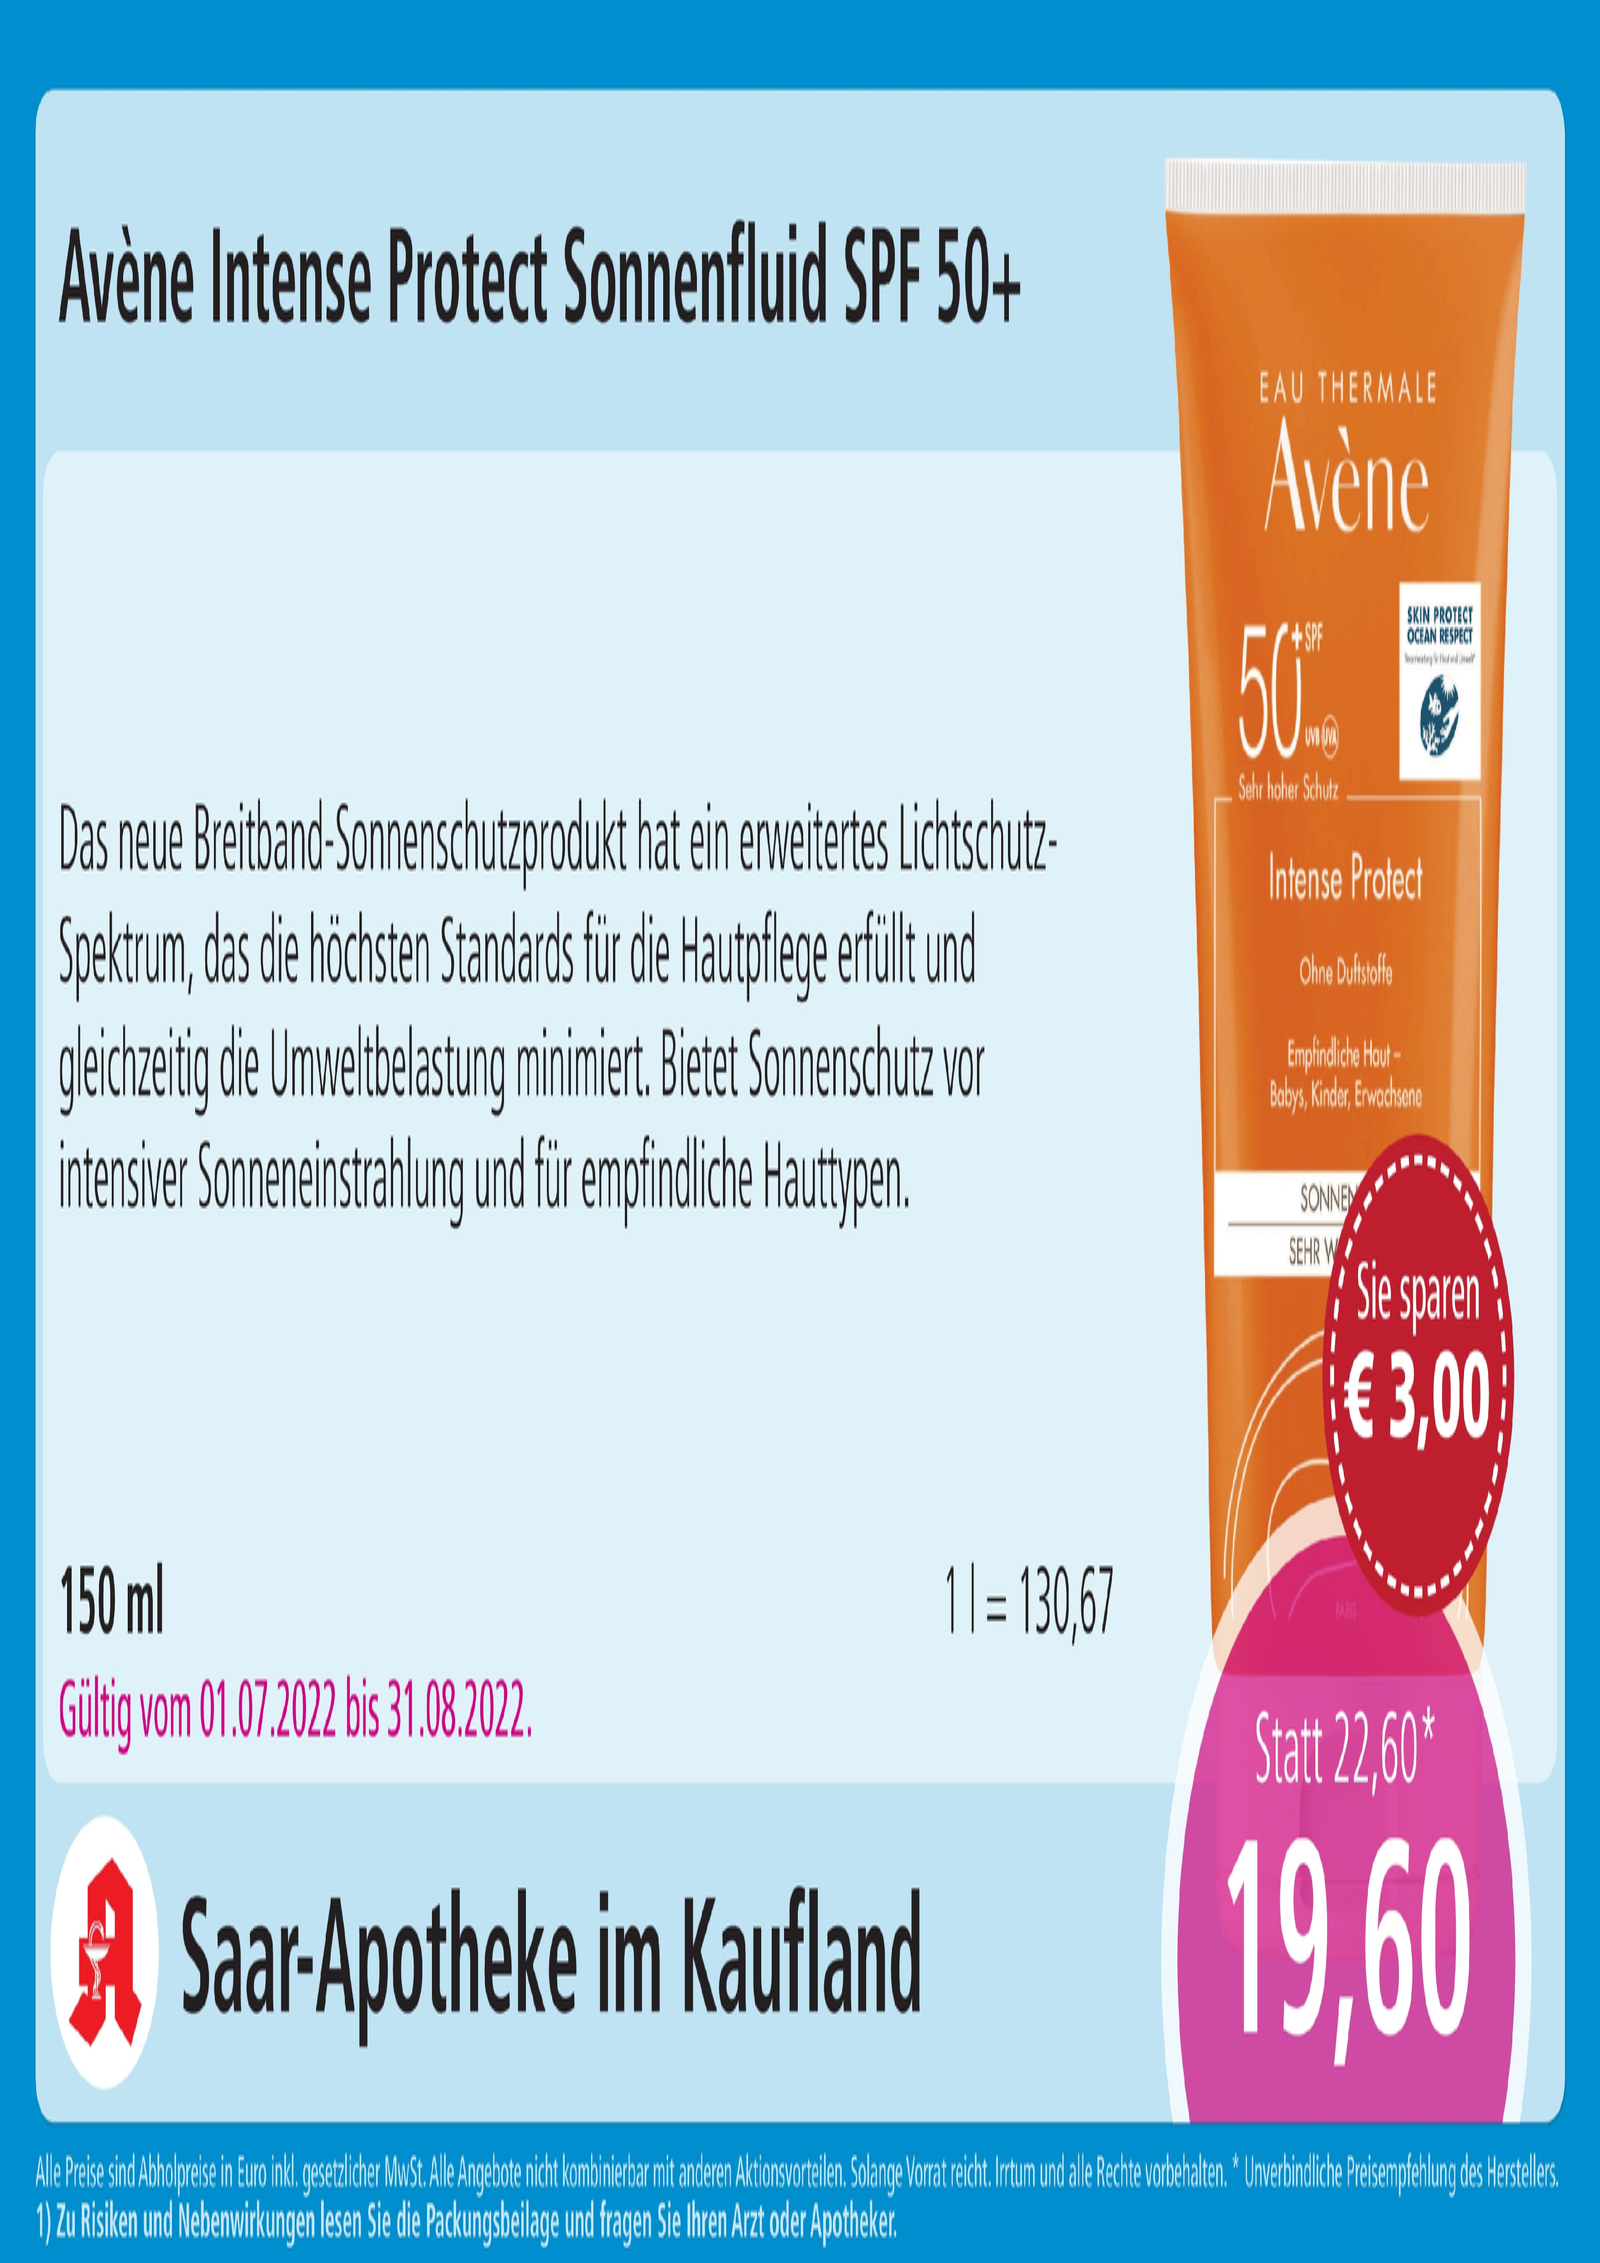 https://mein-uploads.apocdn.net/26719/leaflets/26719_flyer-Seite2.png